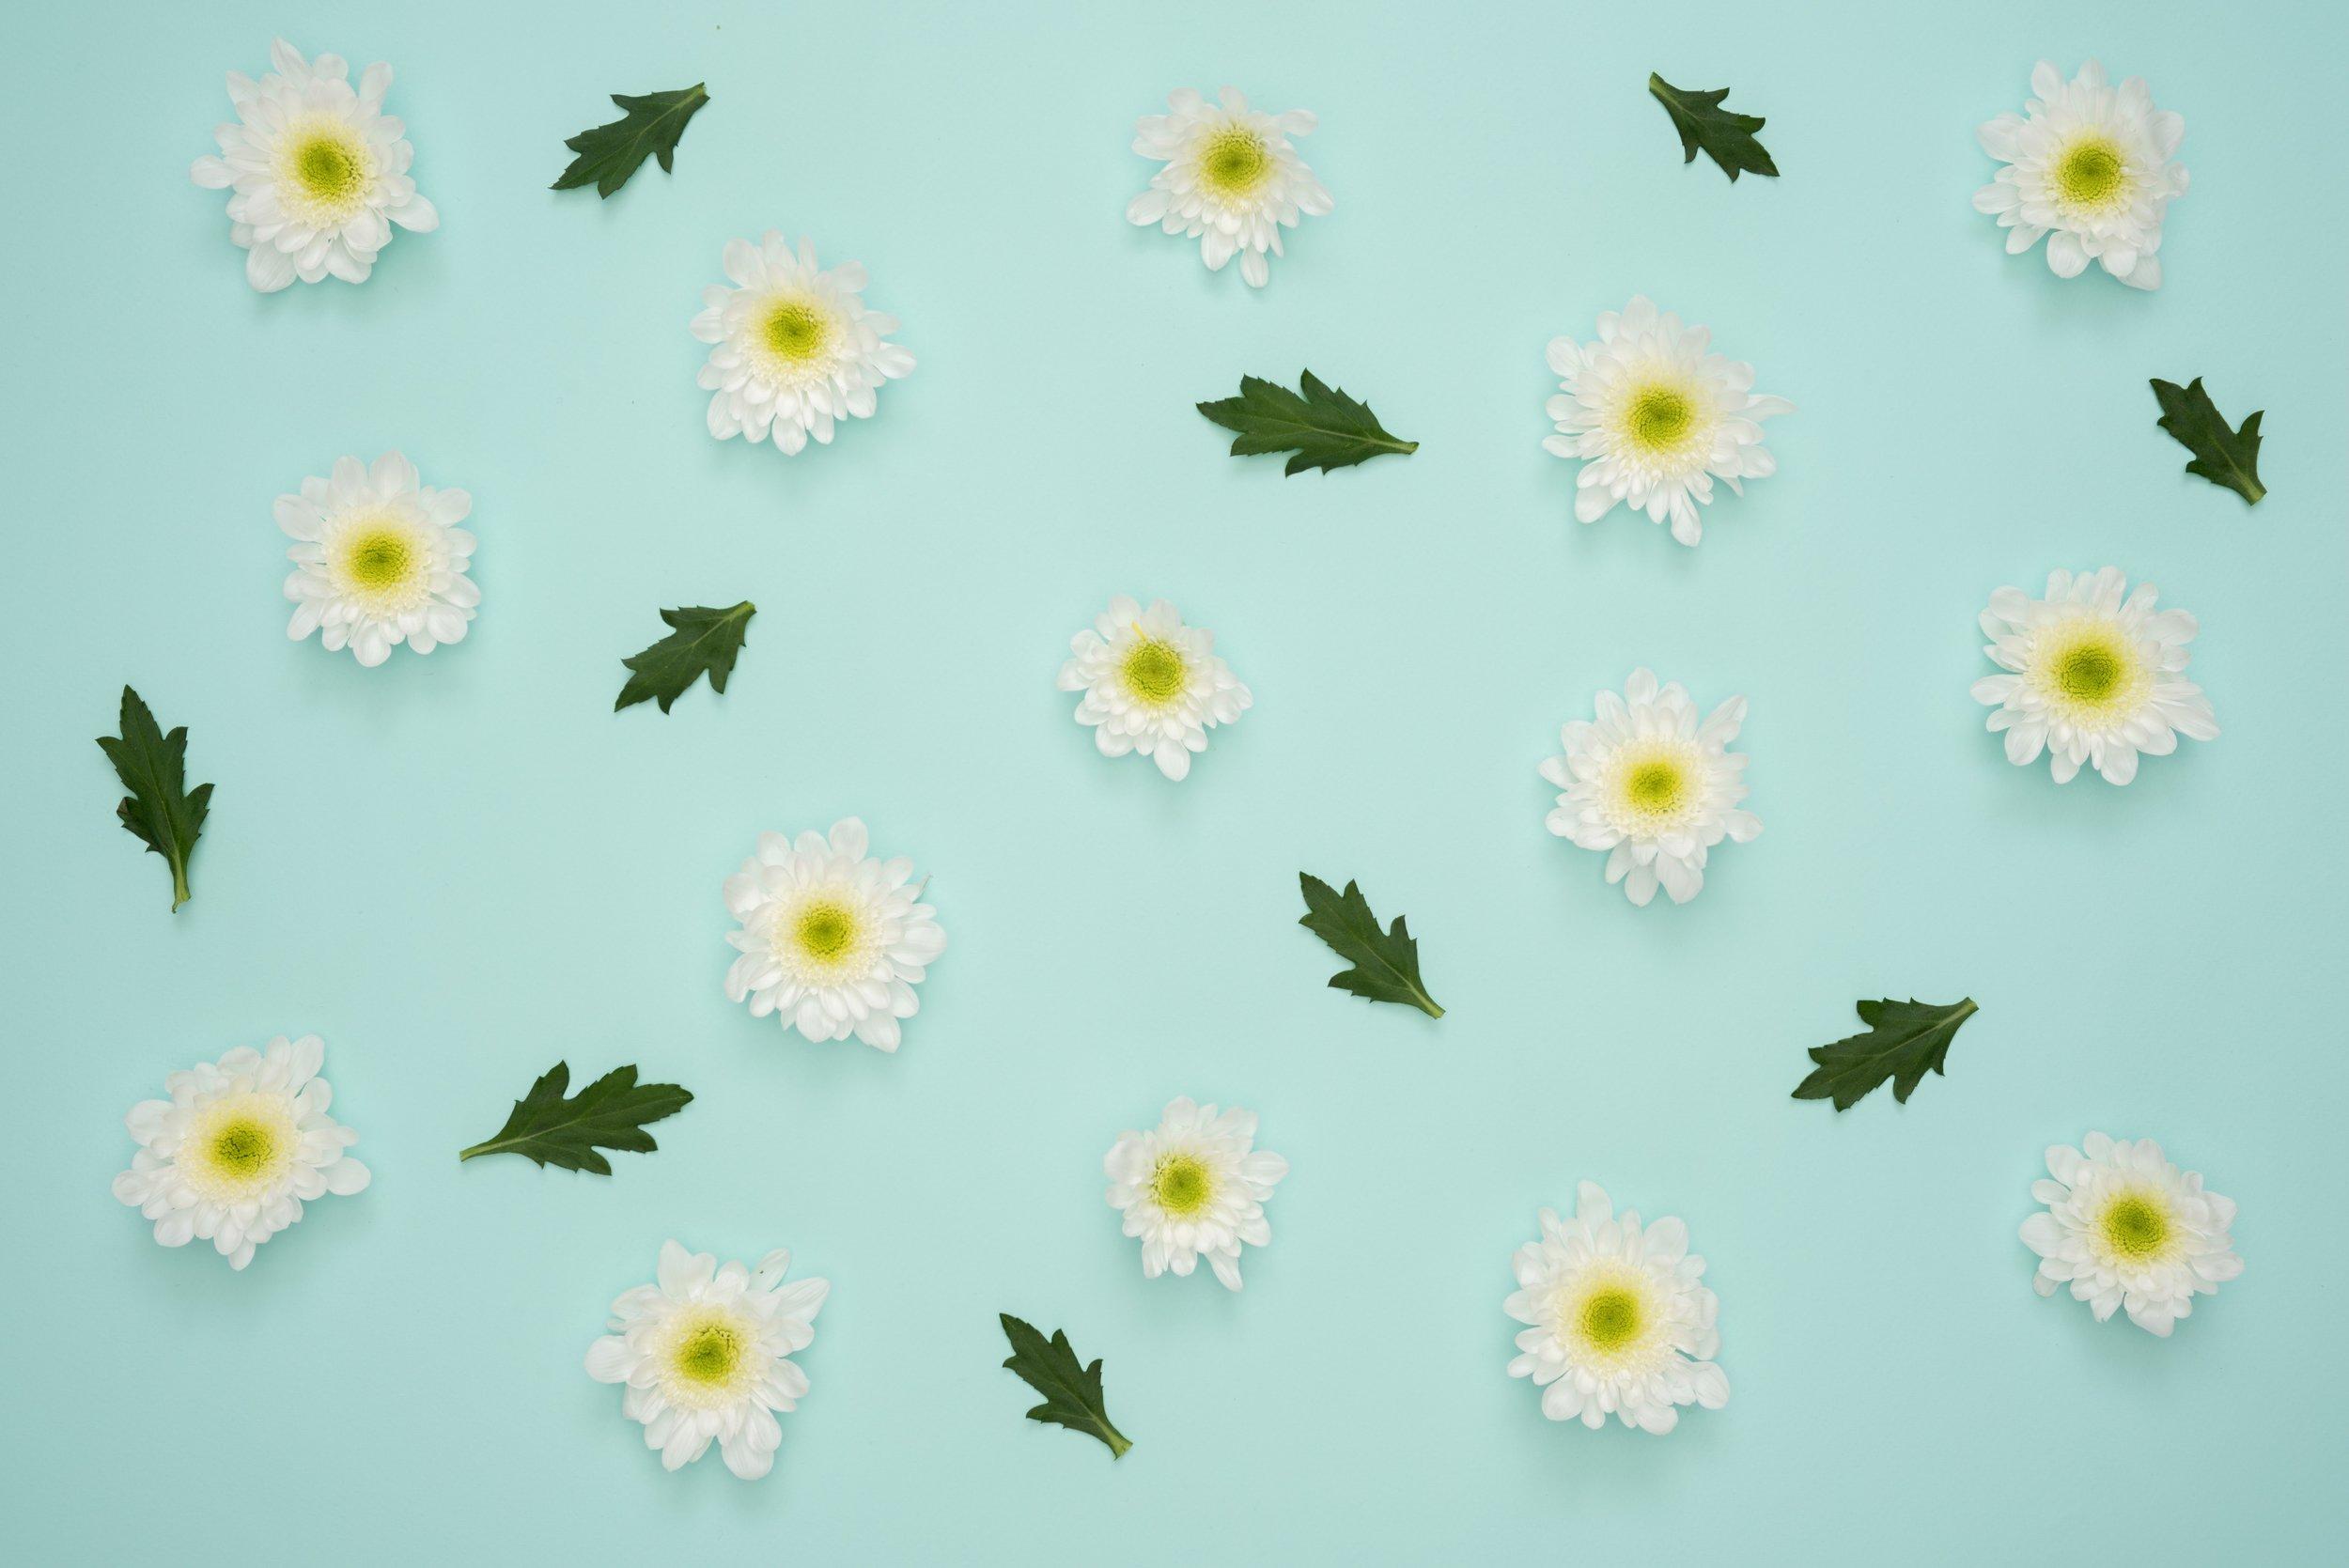 beautiful-blooming-blue-background-1038001.jpg